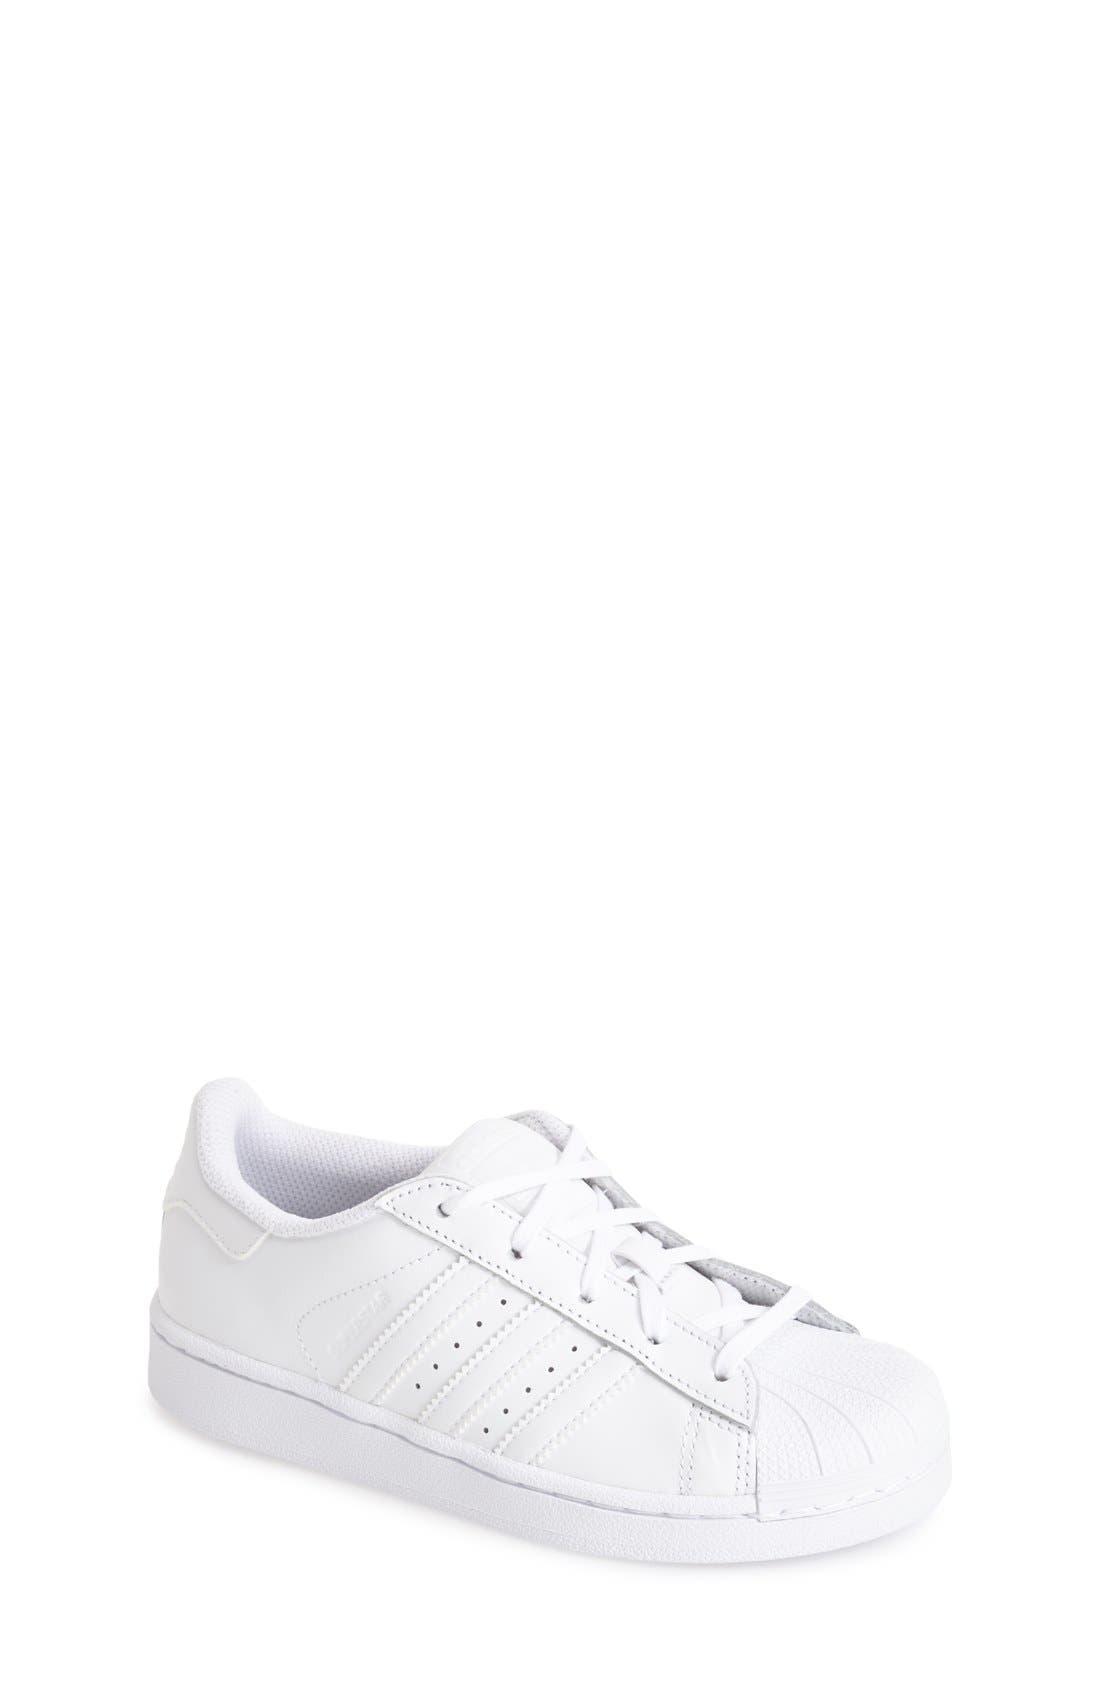 adidas \u0027Superstar C\u0027 Sneaker (Toddler \u0026 Little ...